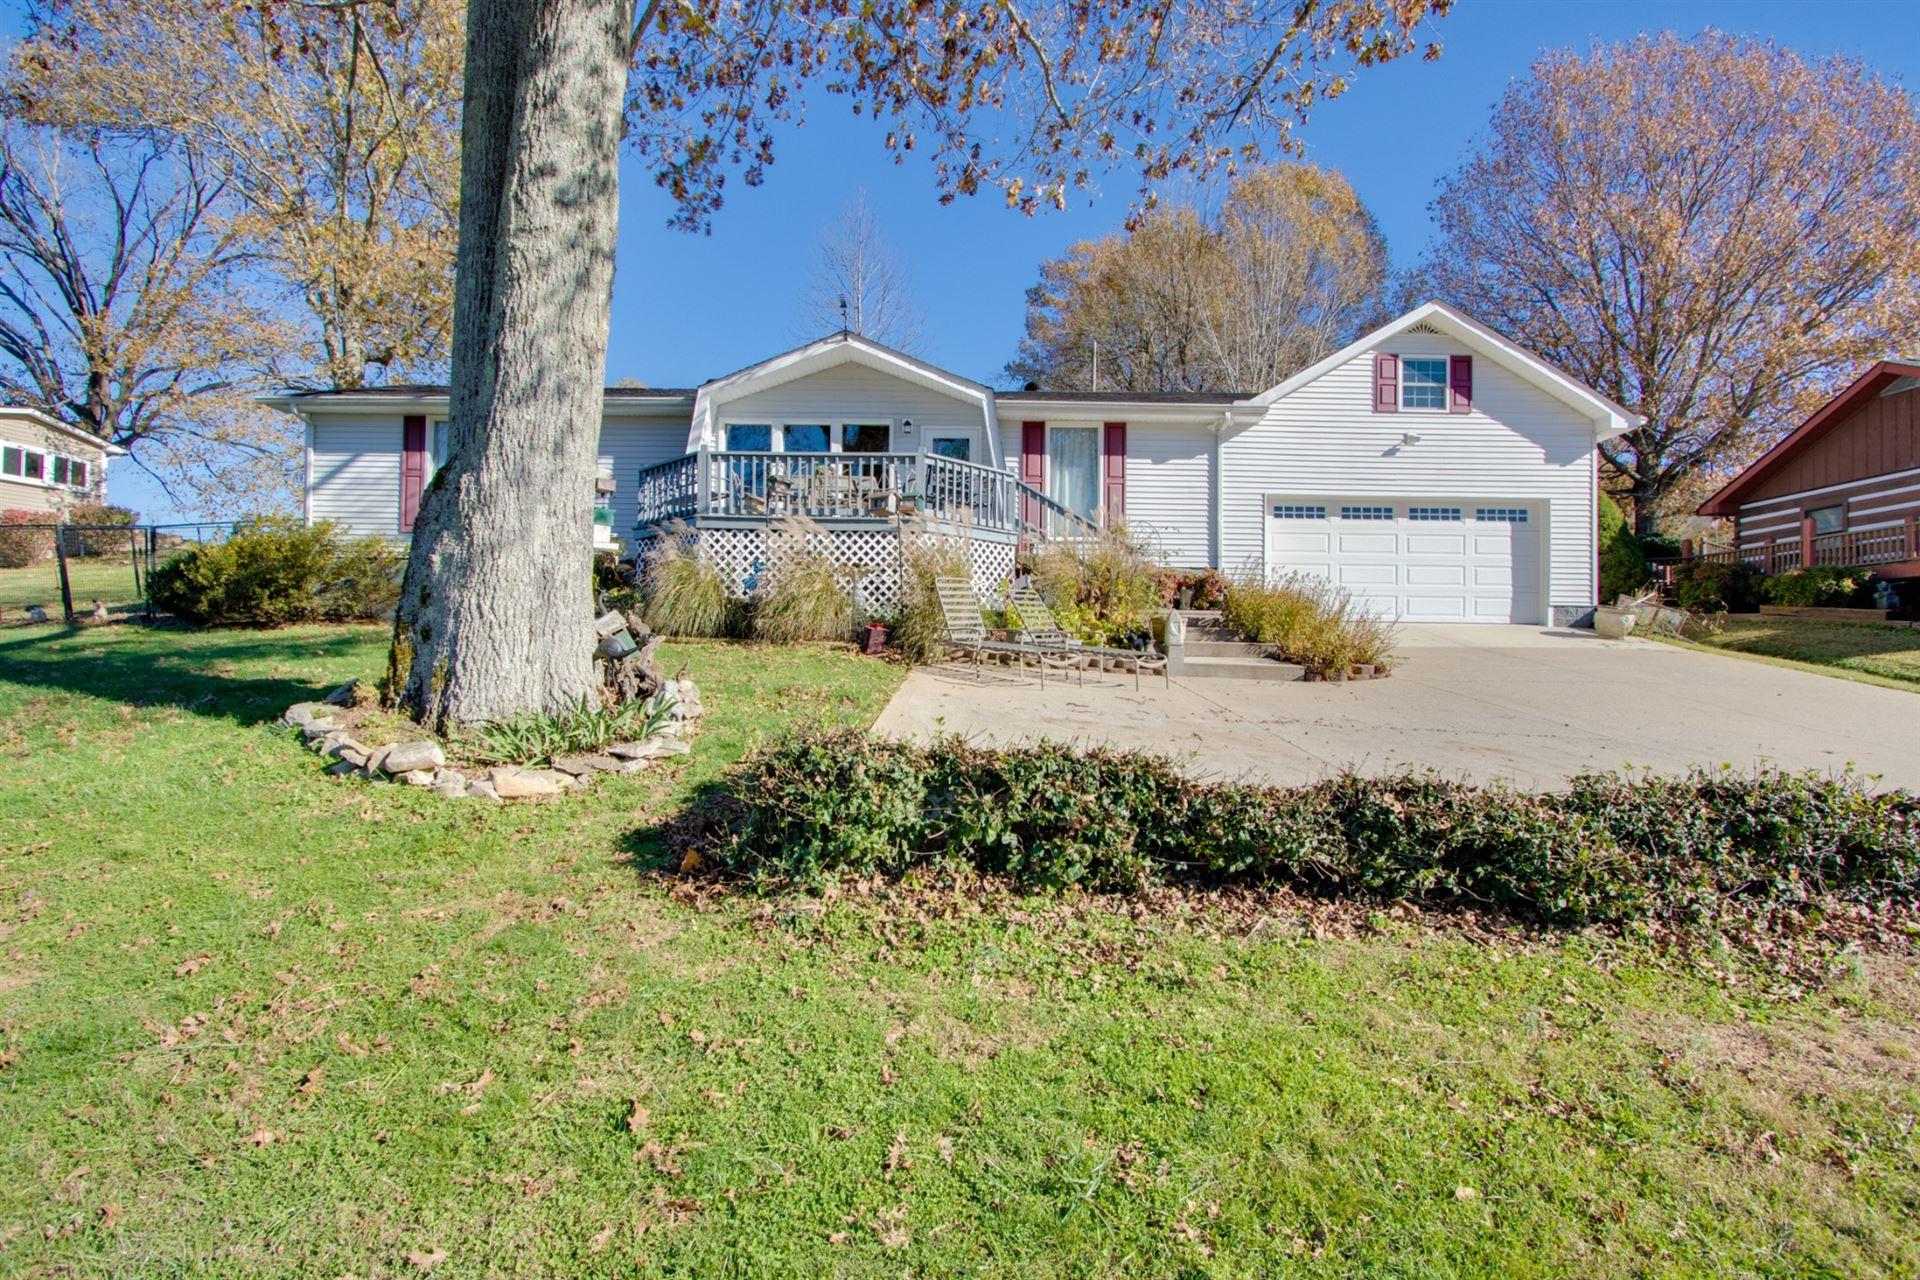 155 Lakeside Dr, Carthage, TN 37030 - MLS#: 2179986